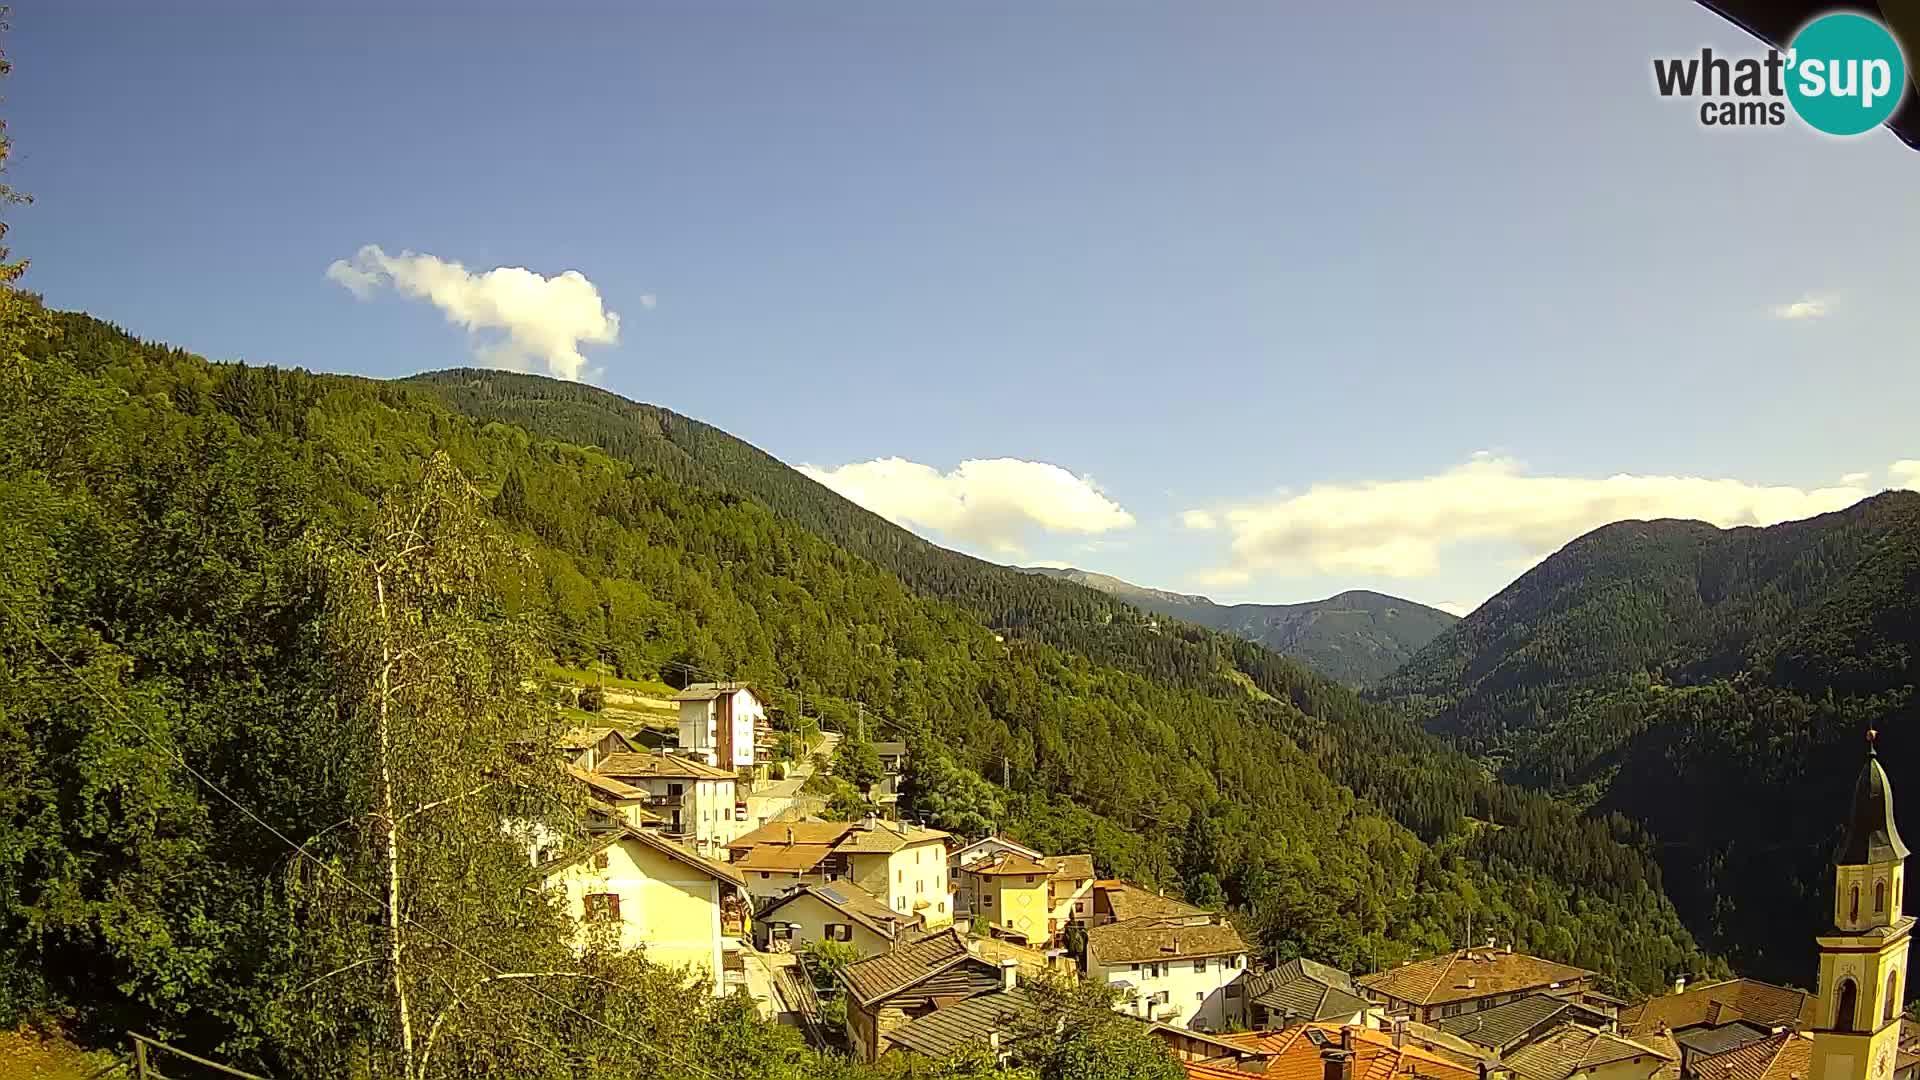 Camera en vivo Sover – Trentino Alto Adige webcam Lagorai